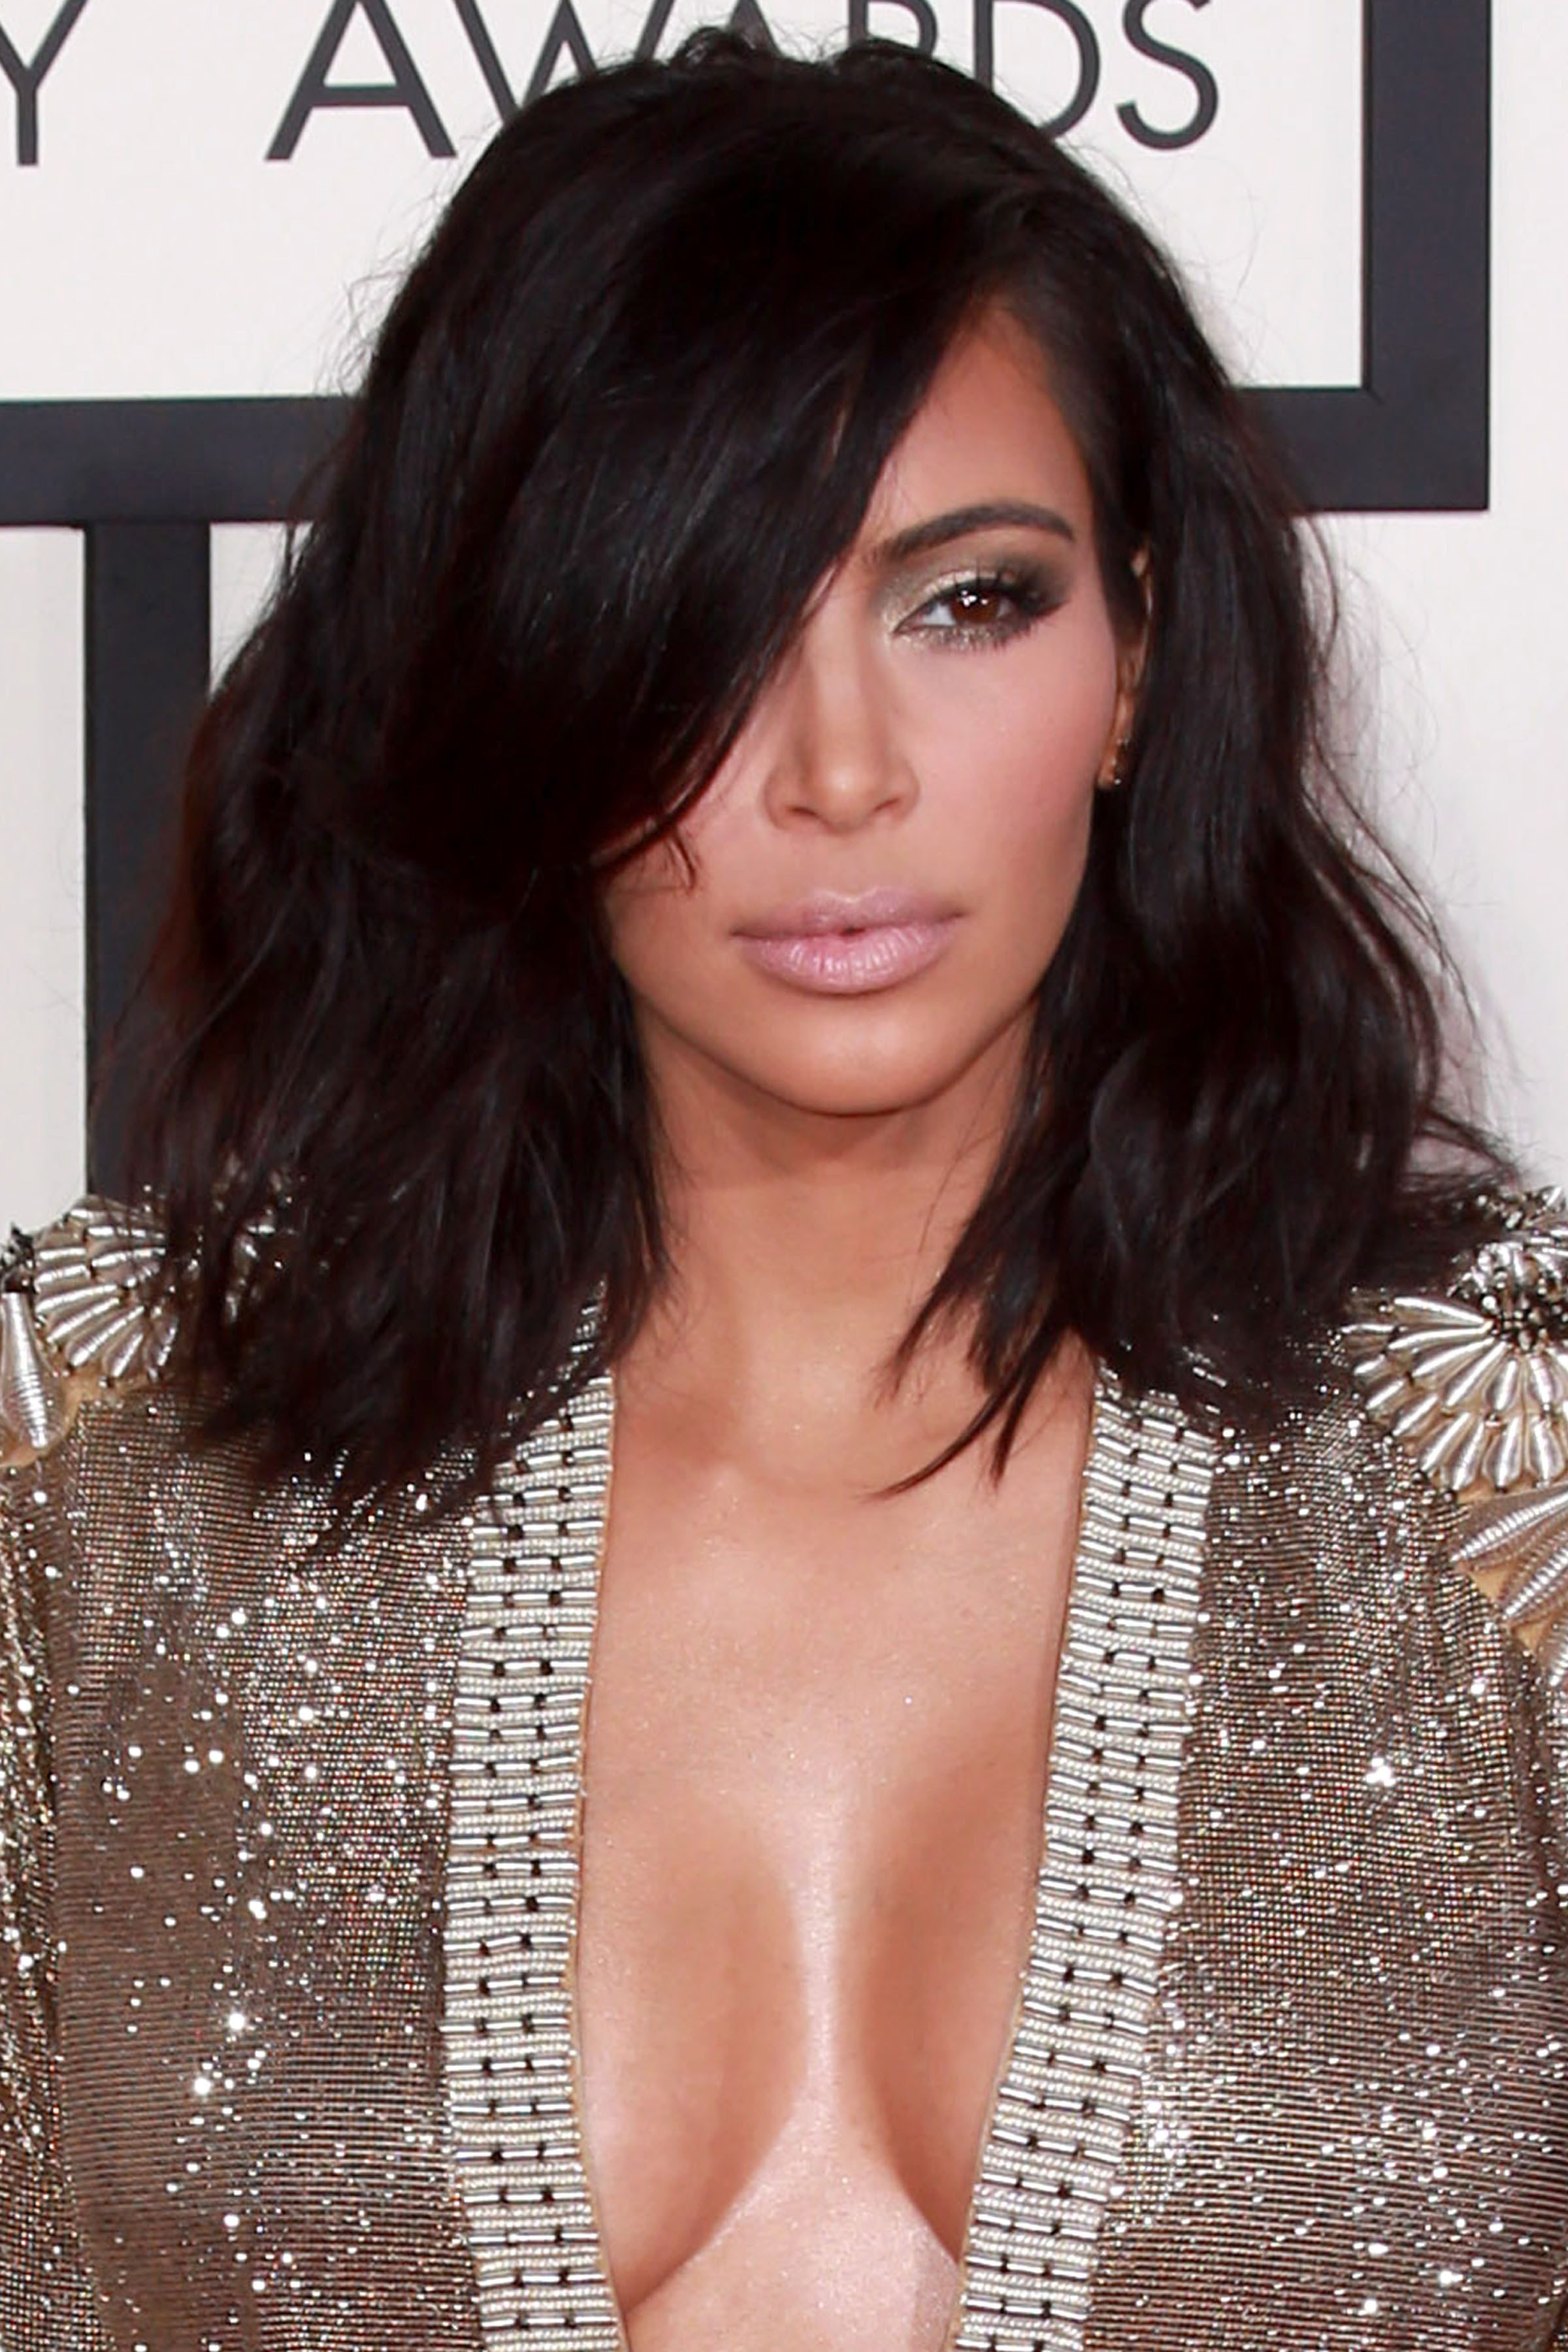 Kim Kardashian's Layered Lob With Long Side Bangs